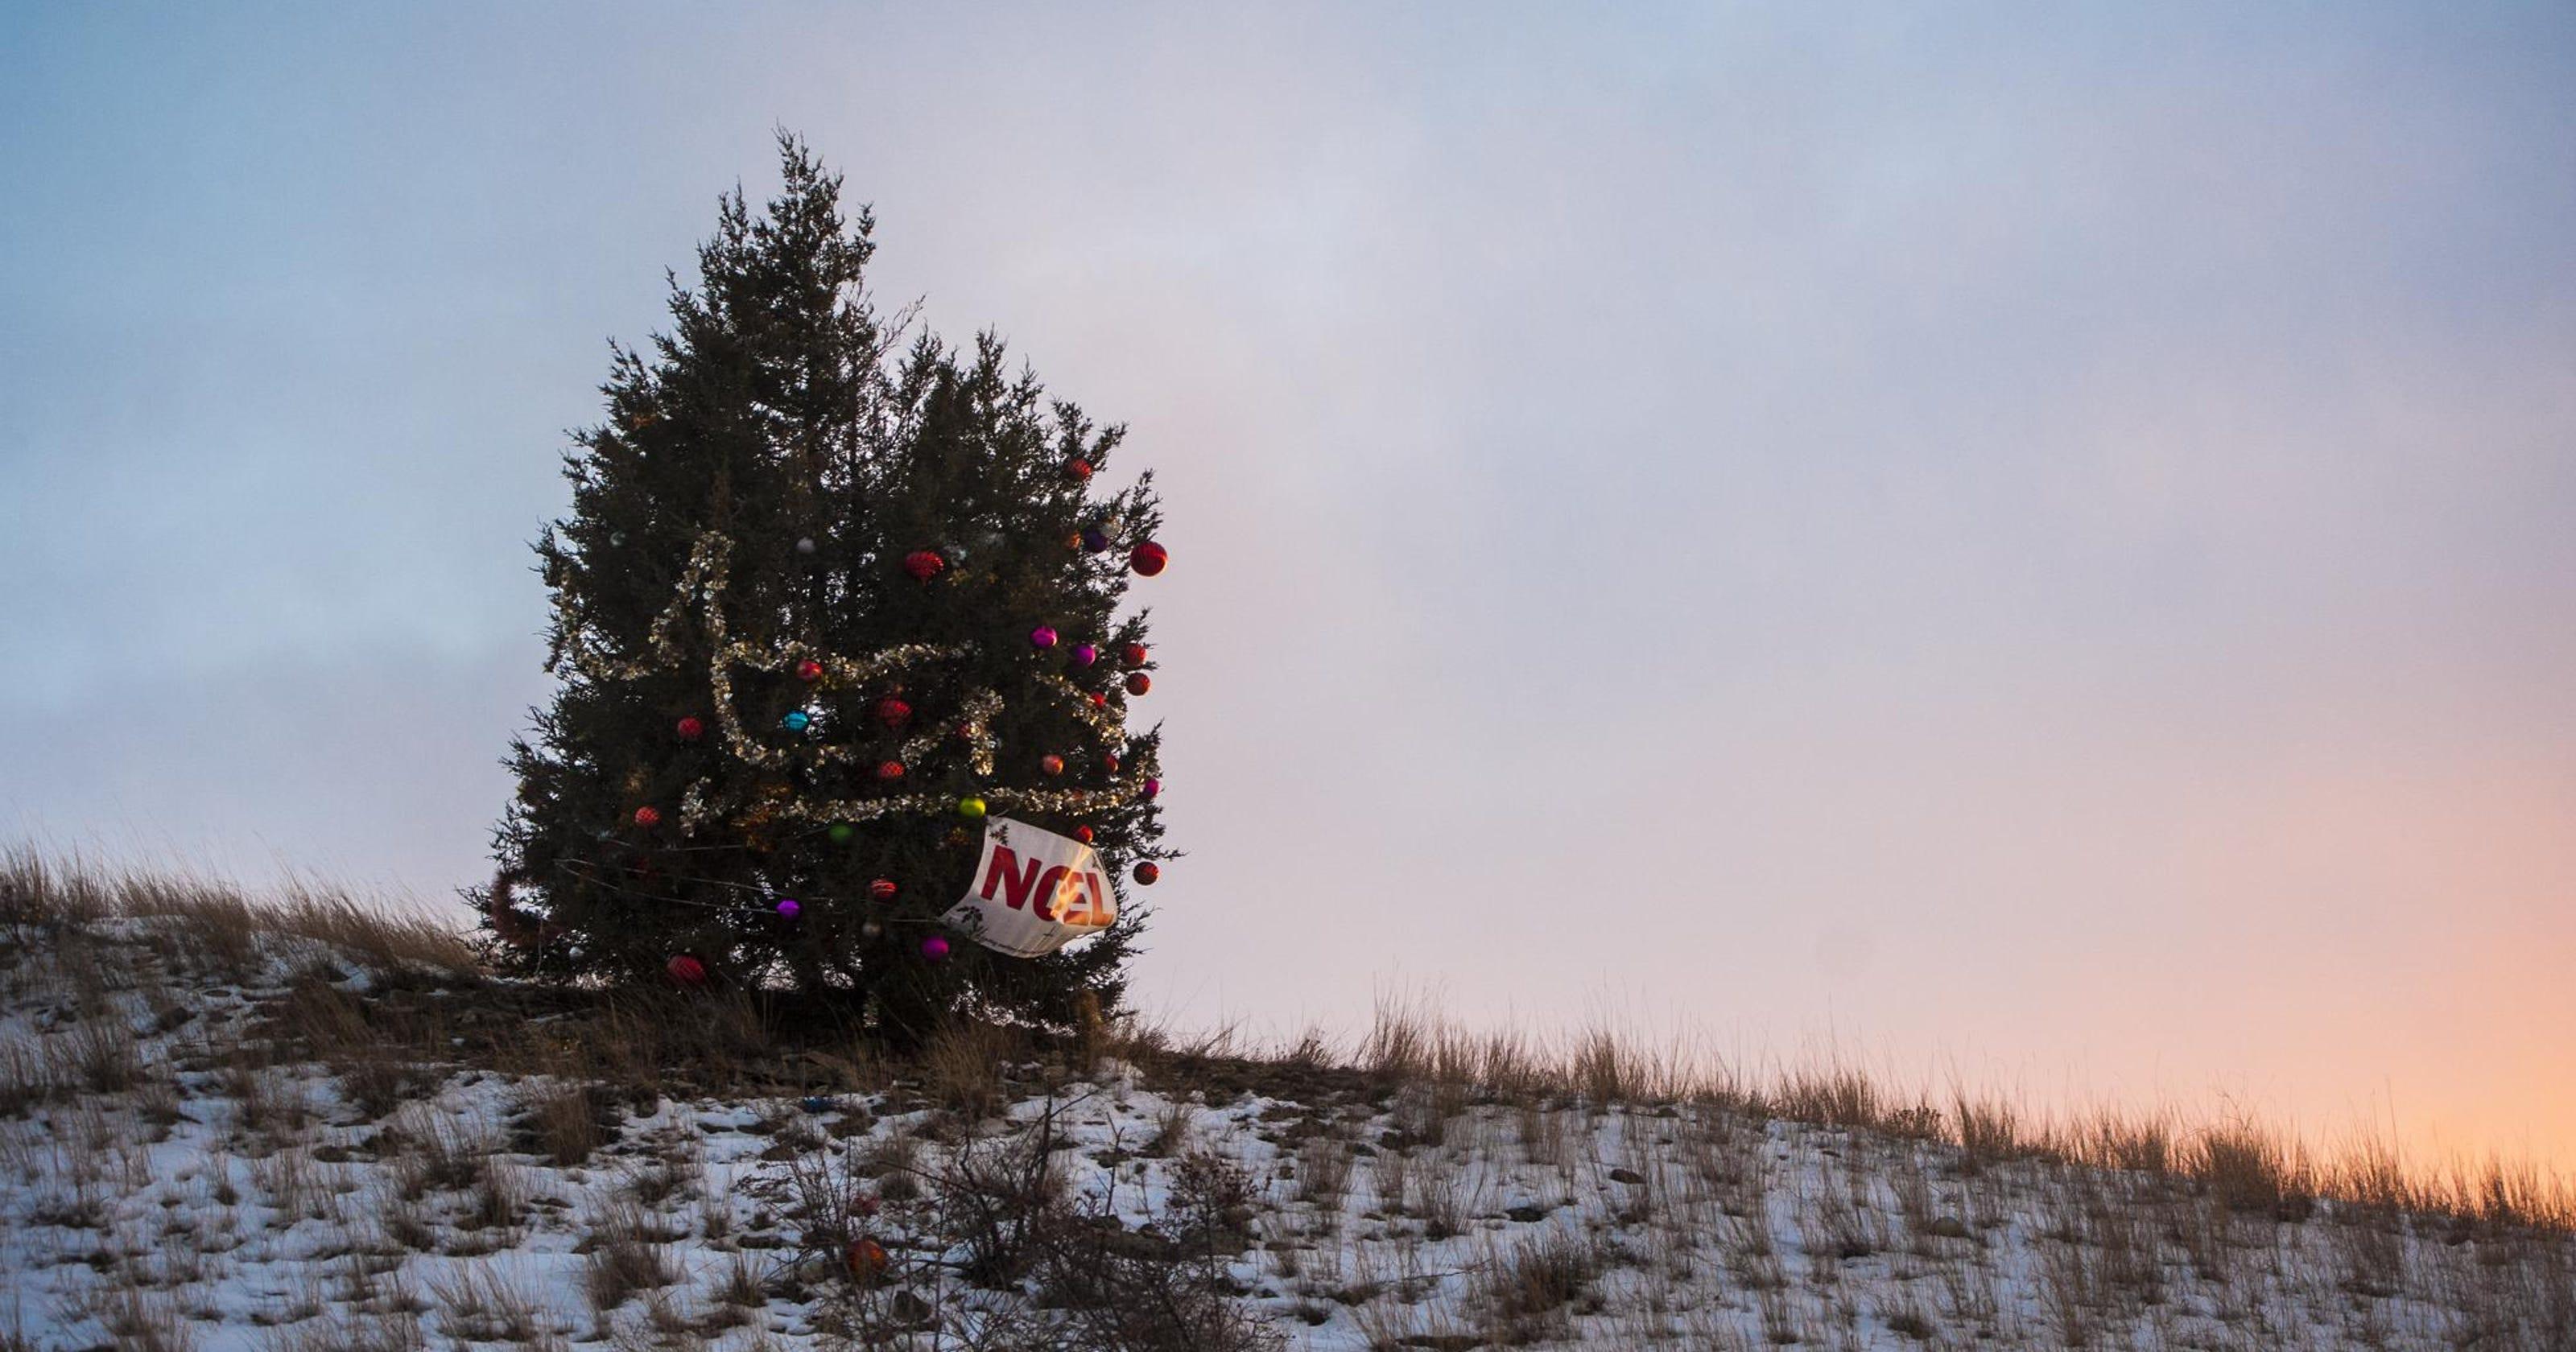 Noel Tree 2.0: Great Falls men saving Noel Tree tradition